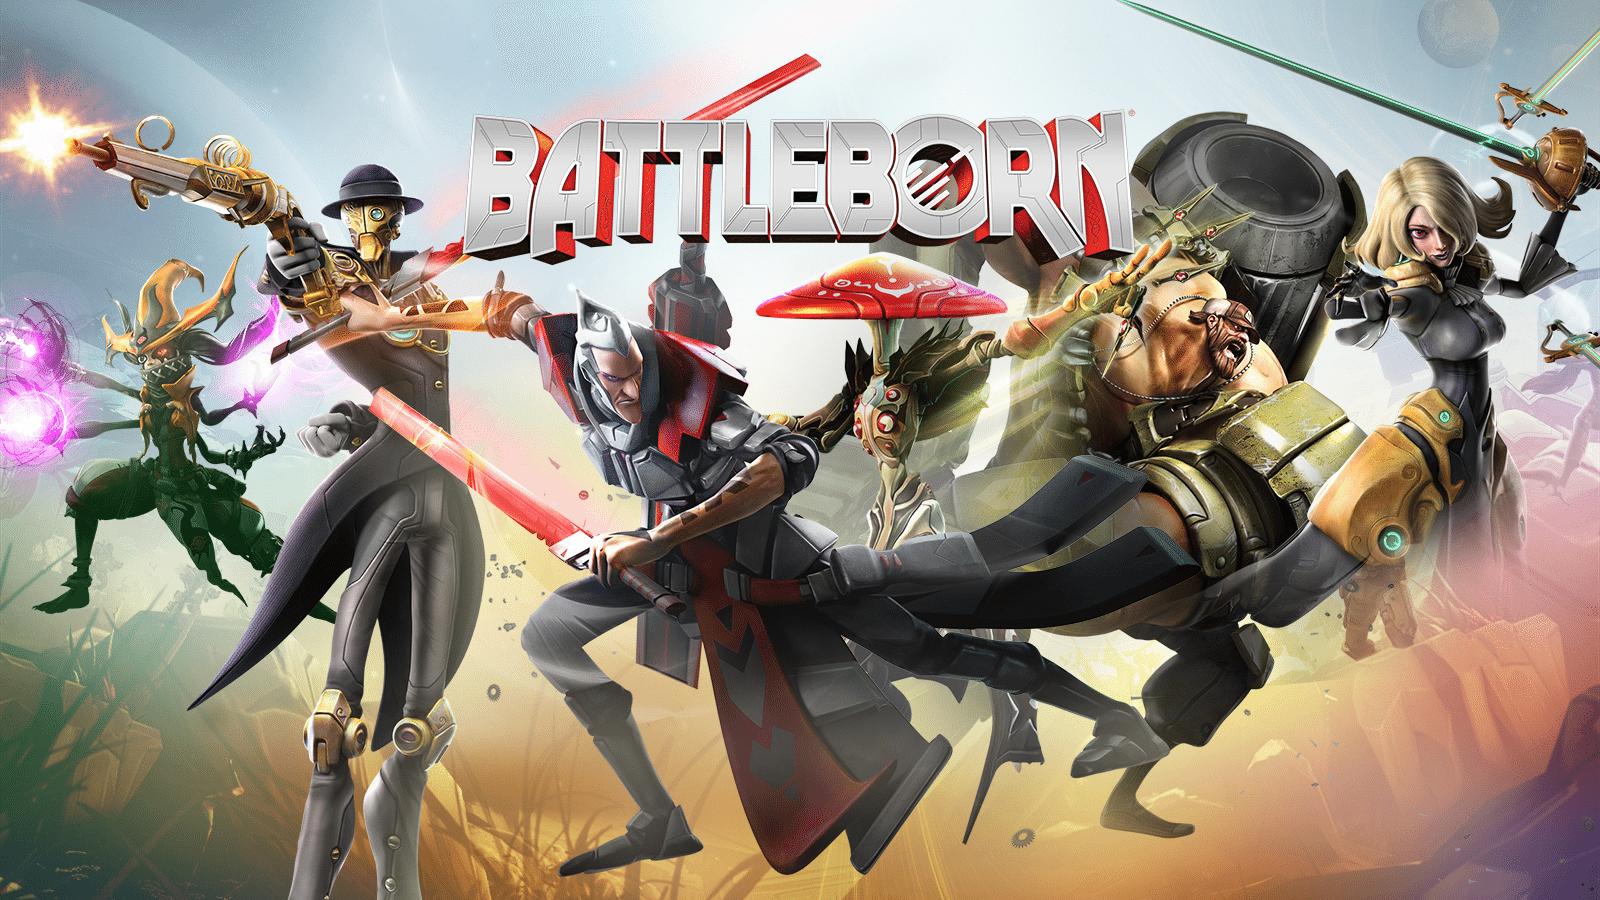 battleborn-listing-thumb-01-ps4-us-30nov15